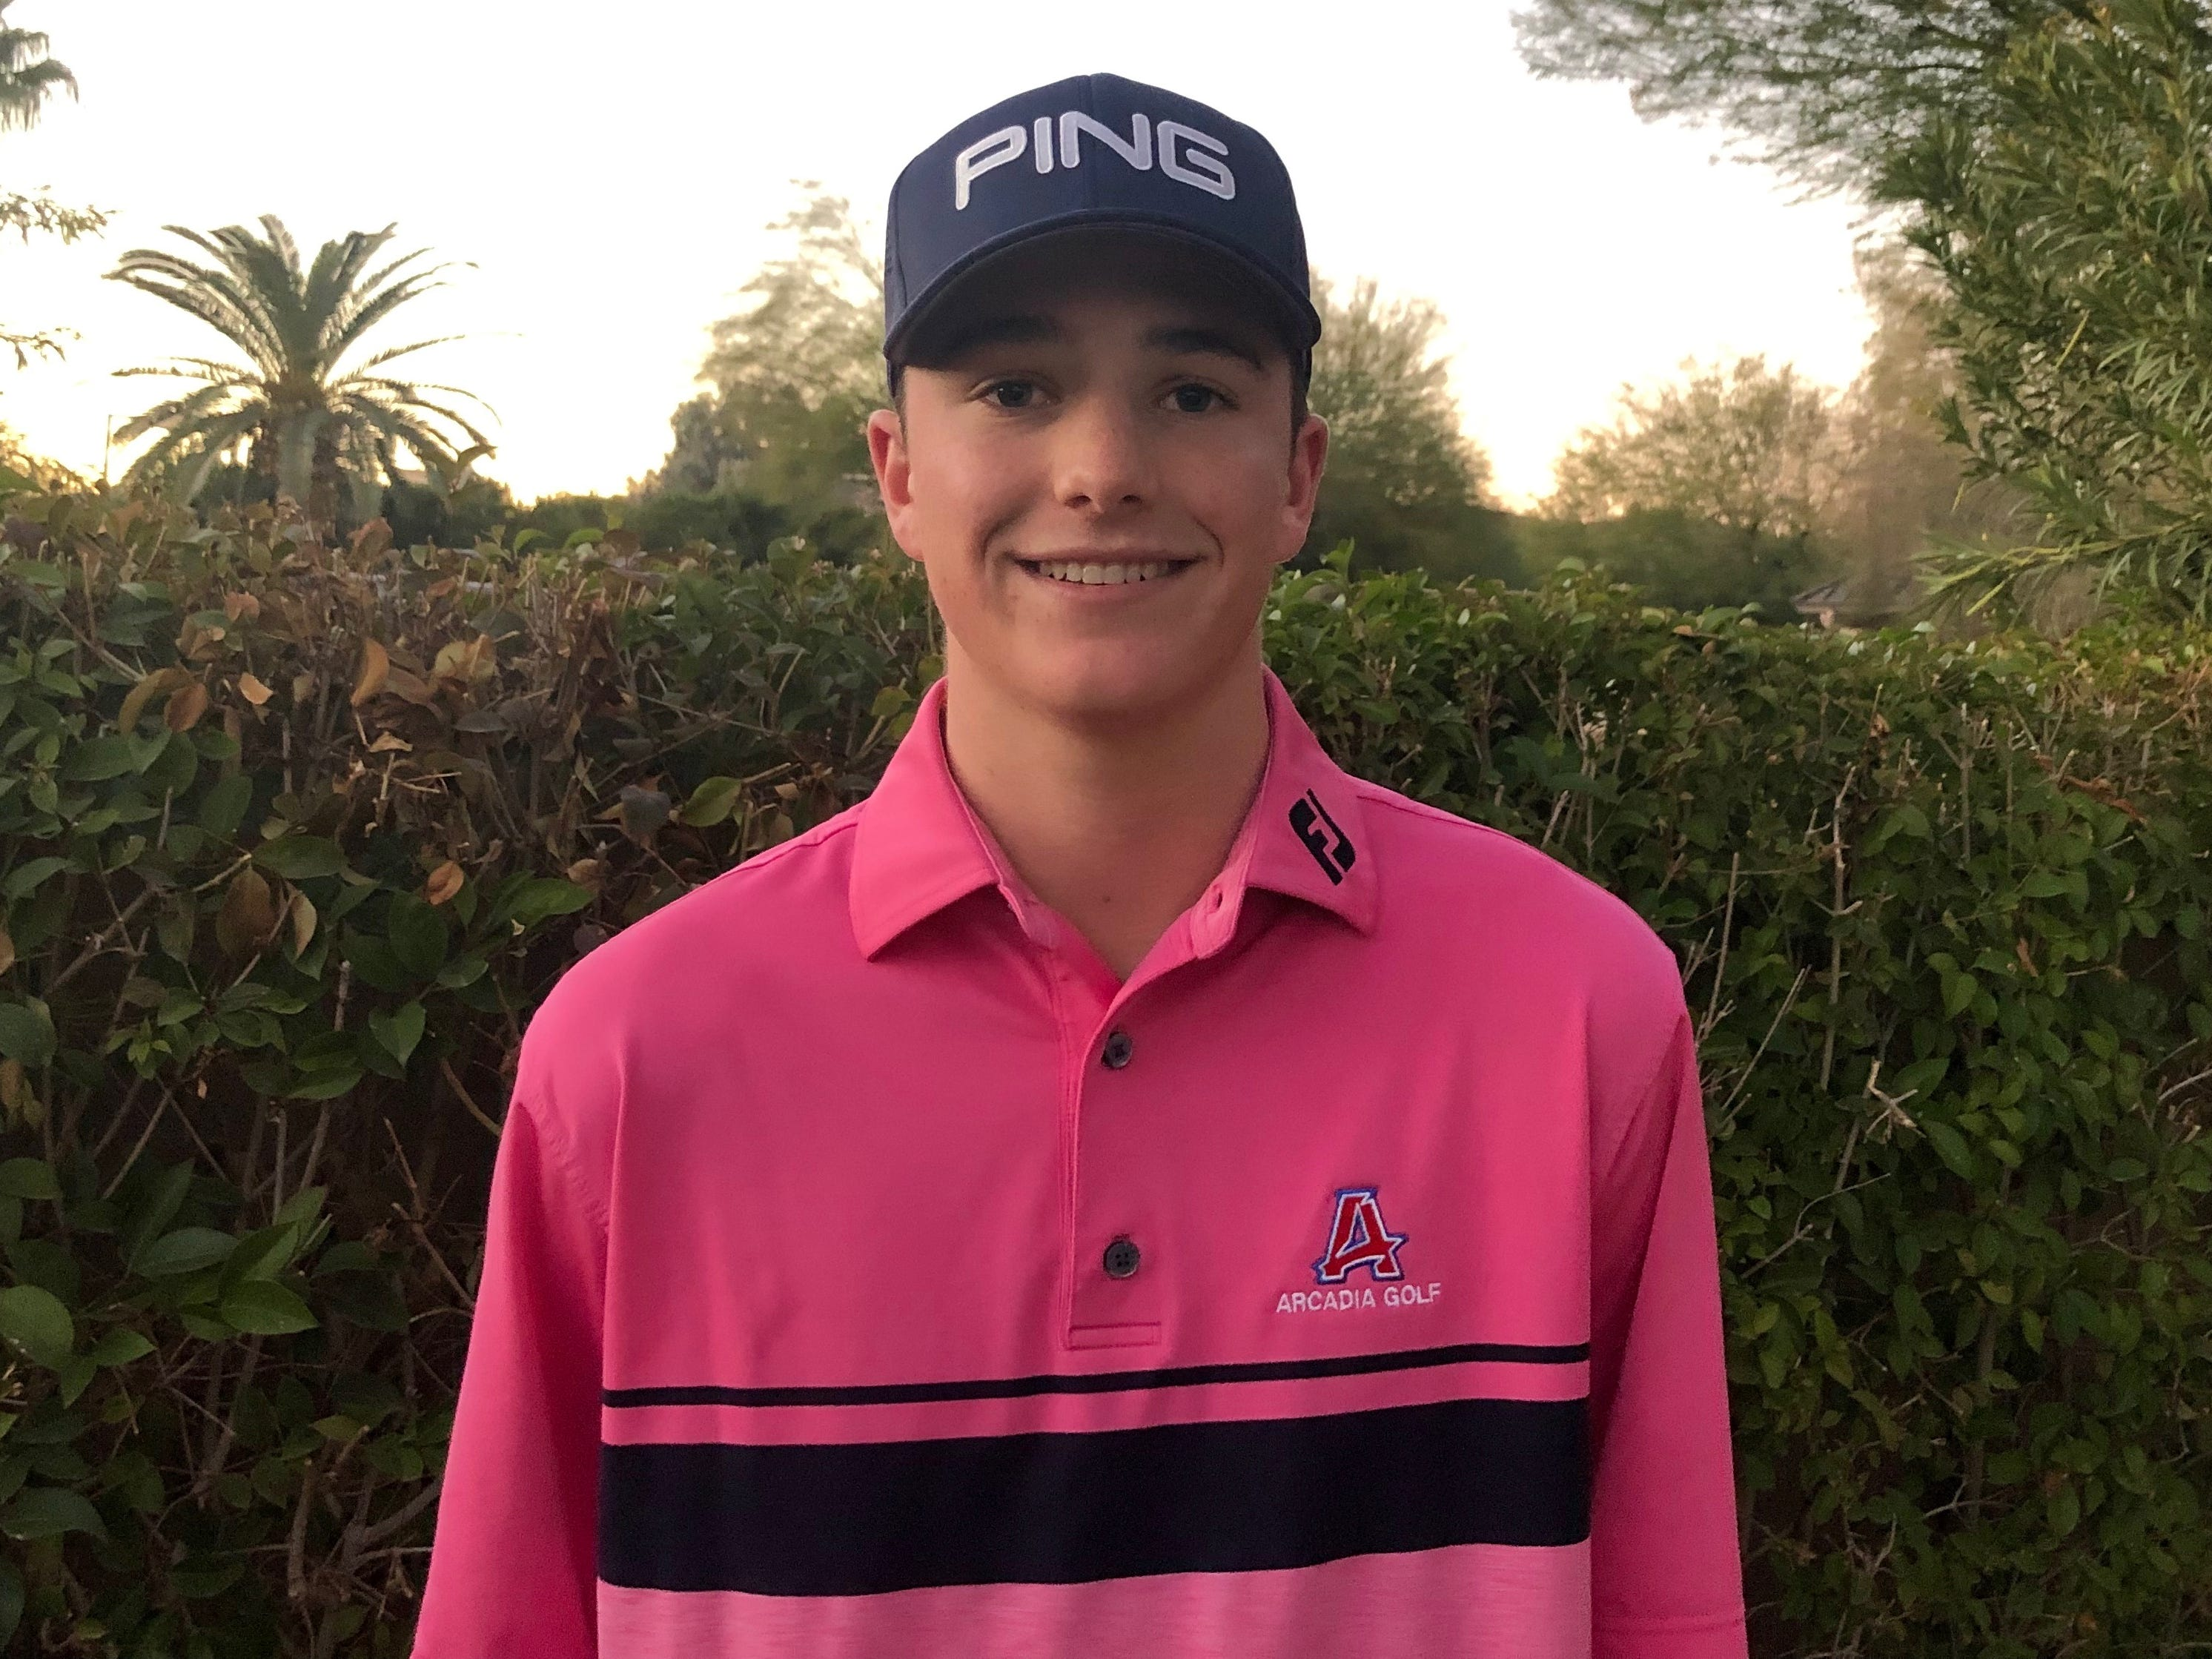 Tucker Clark of Arcadia boys golf azcentral Sports Awards